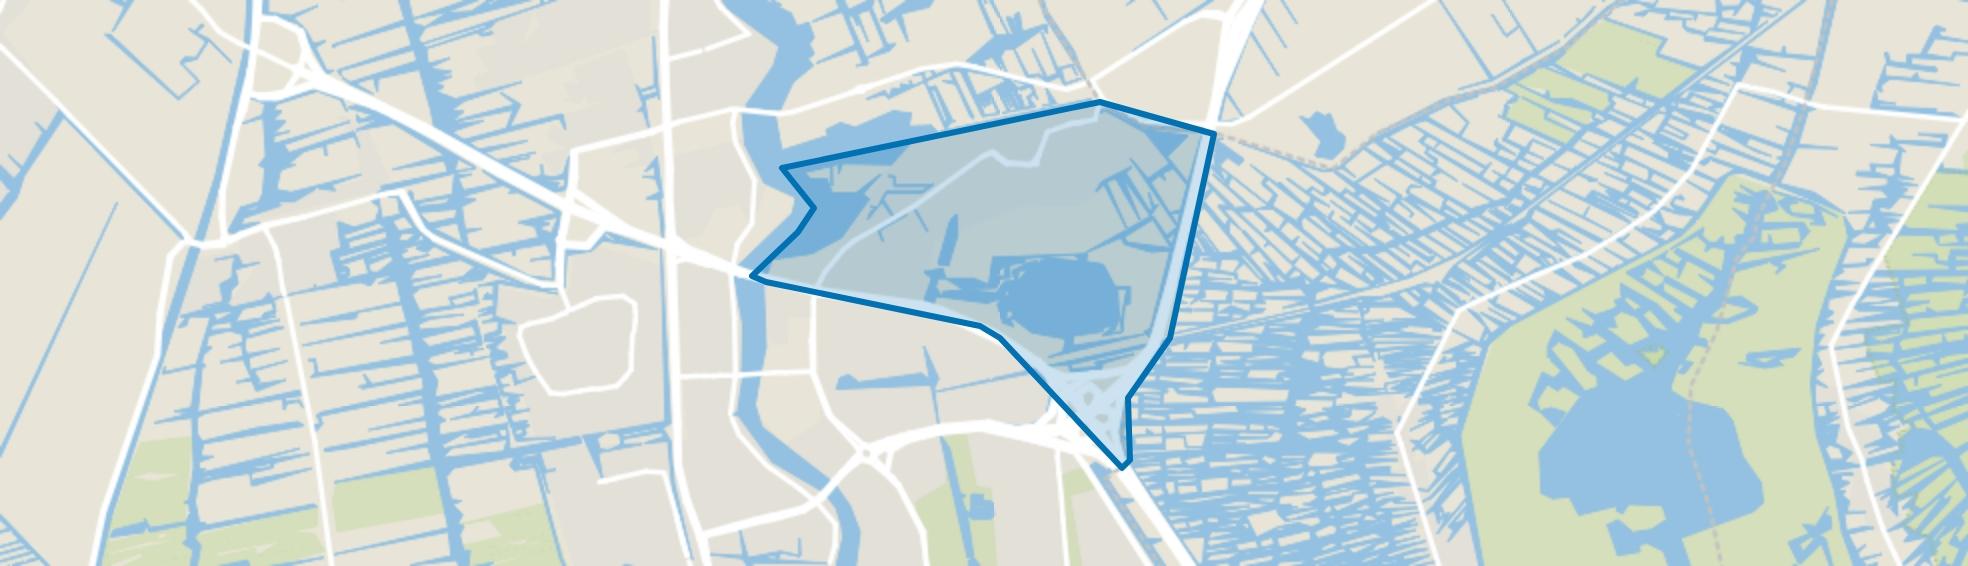 Kalf, Zaandam map